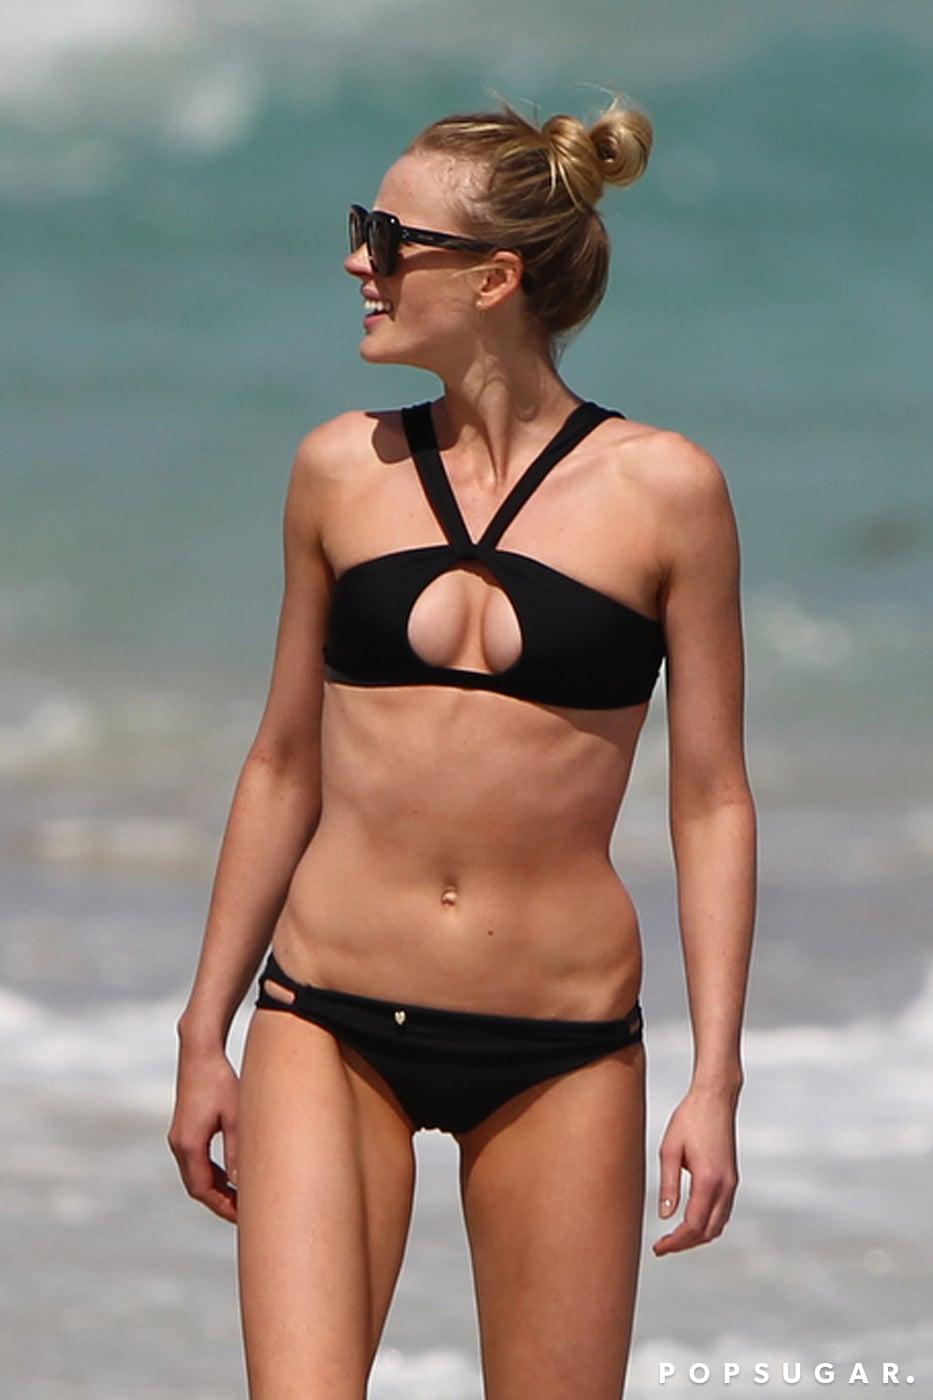 Even on Her Off Days, Anne V Still Works a Bikini